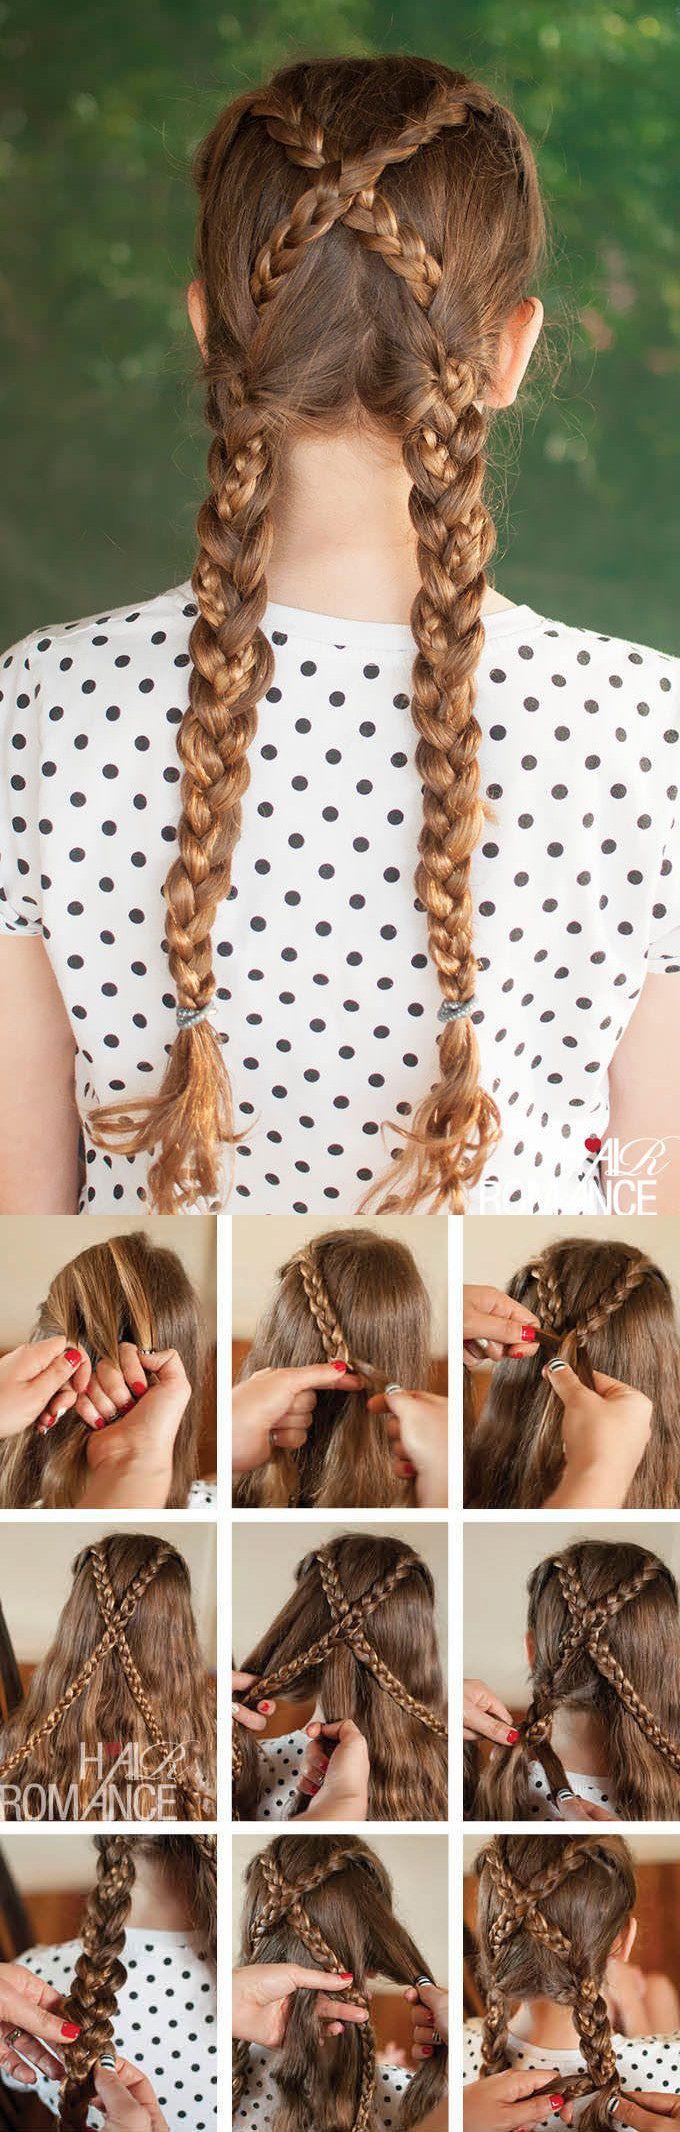 Sensational 1000 Ideas About Disney Hair Tutorial On Pinterest Disney Hair Short Hairstyles Gunalazisus